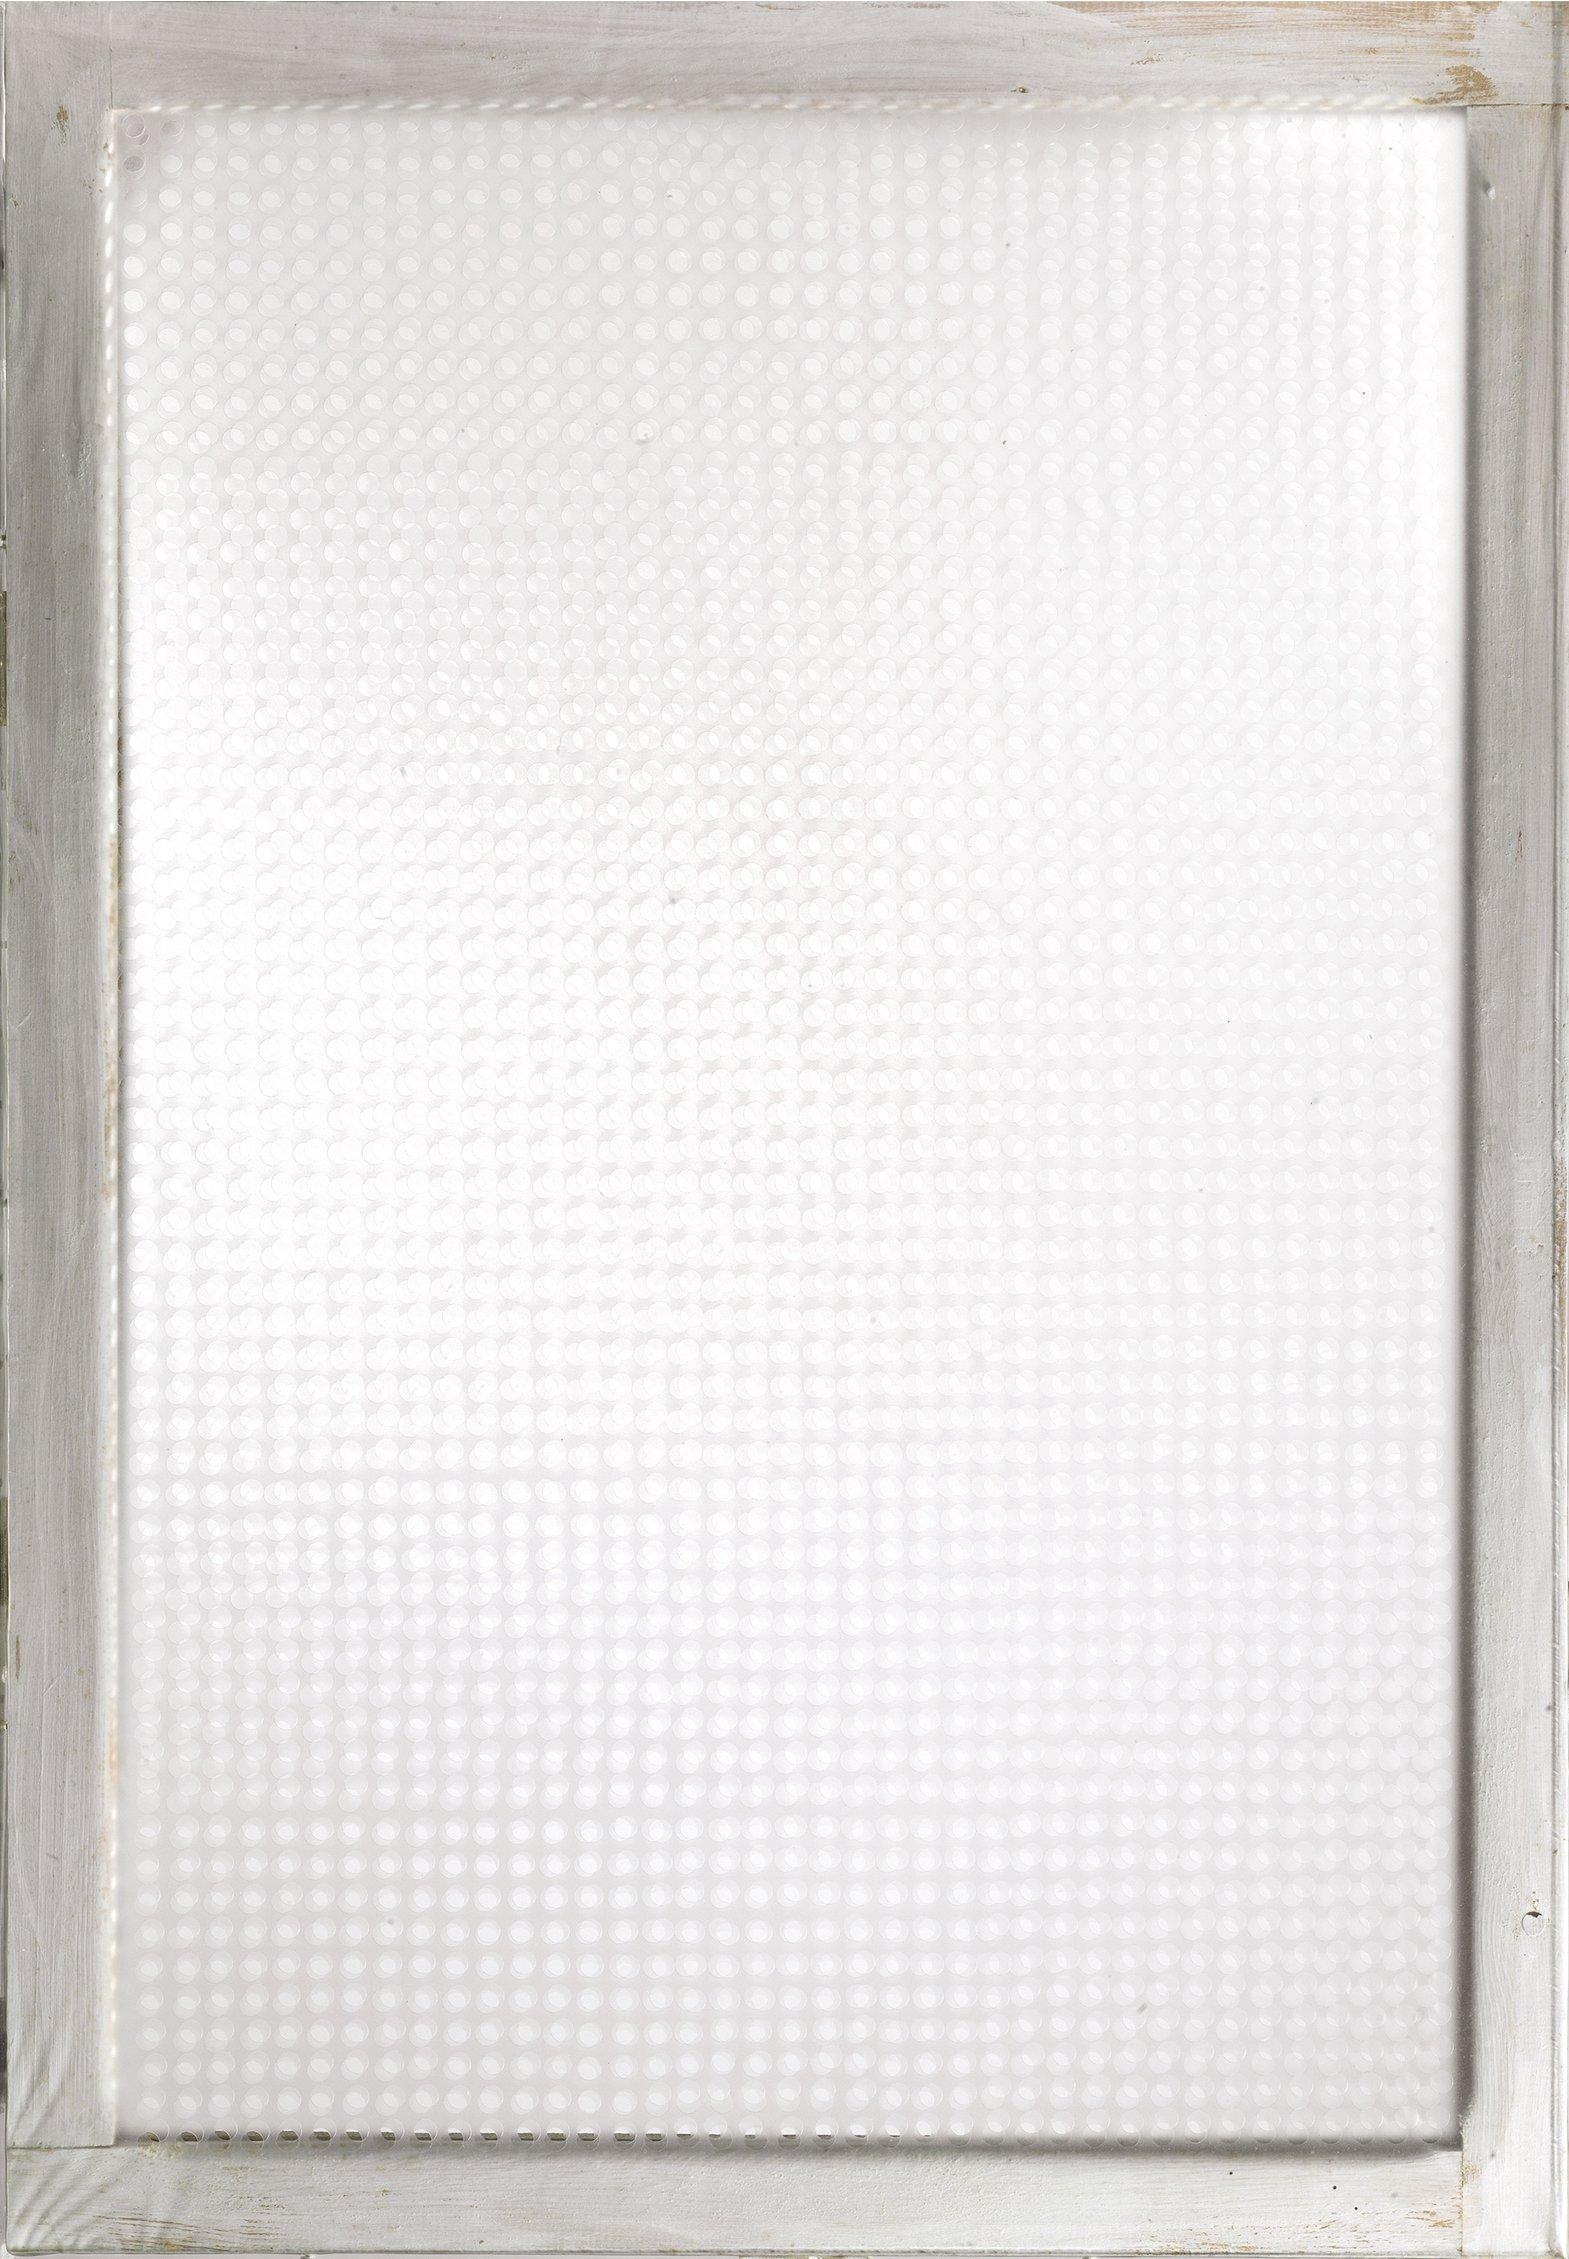 Dadamaino, Volume a moduli sfasati, 1960, plastica perforata su telaio, 100x70 cm